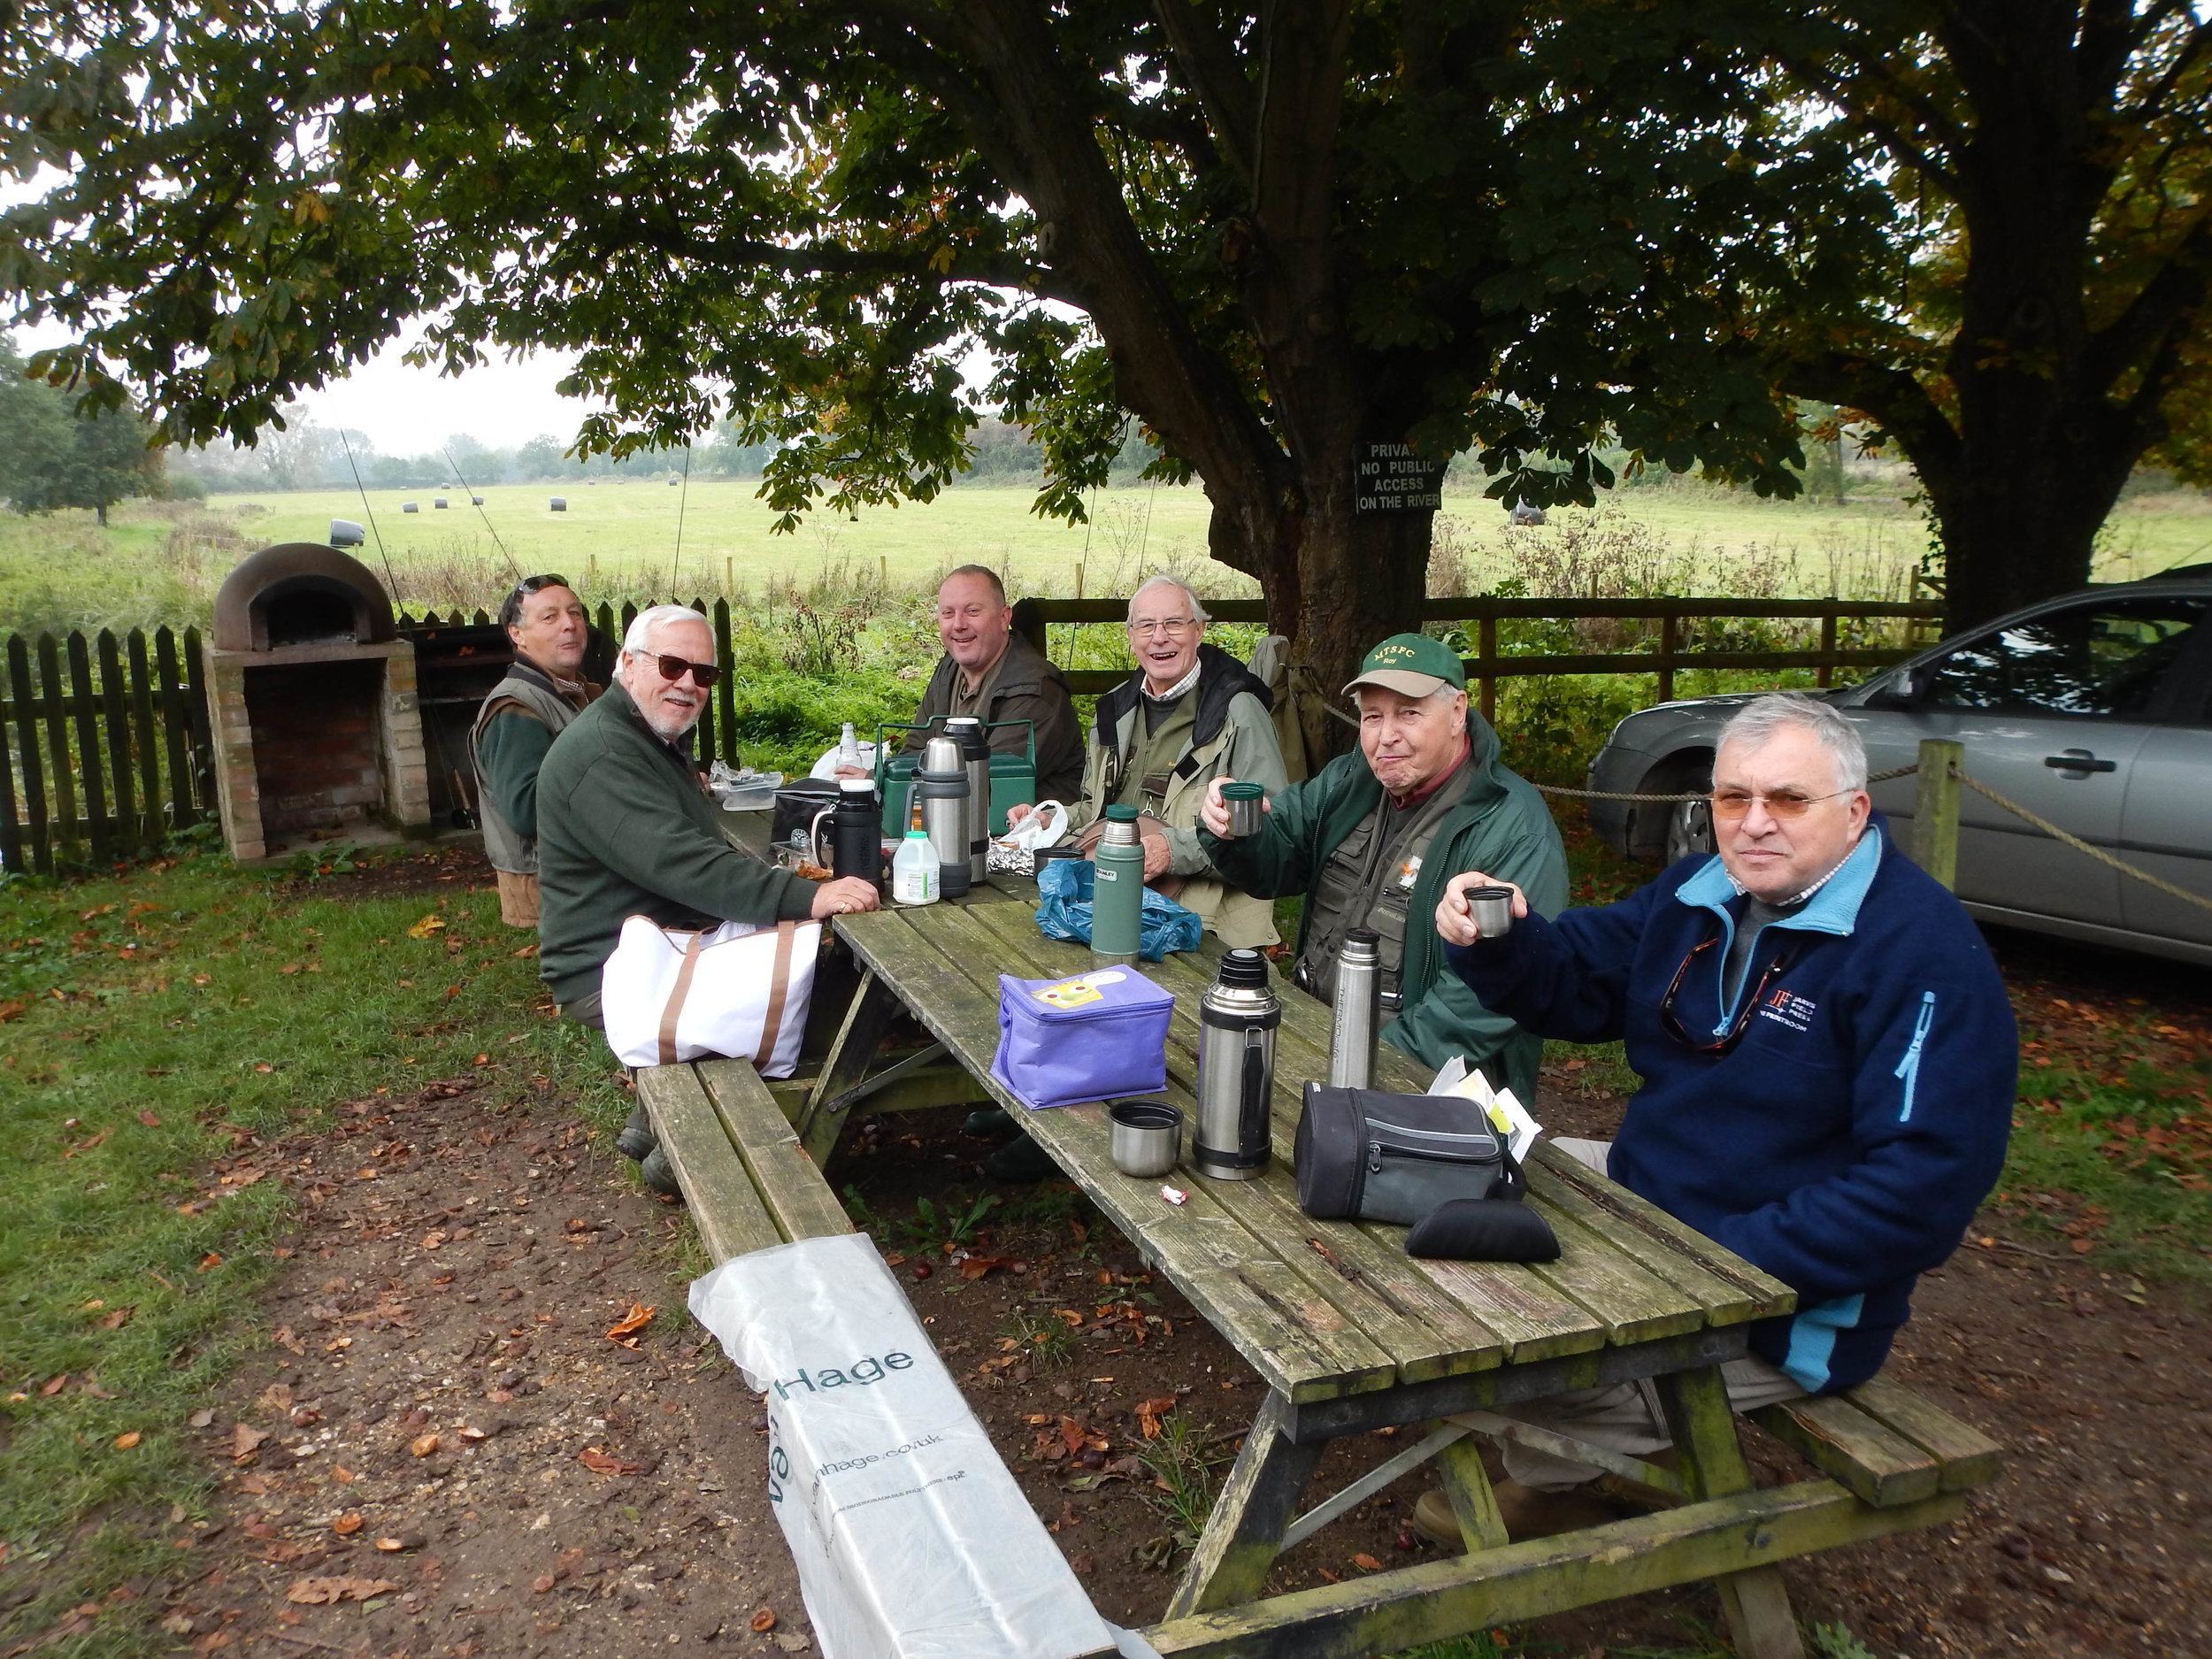 Lunch - Gary, Alan, Keith, David, Roy, Bill